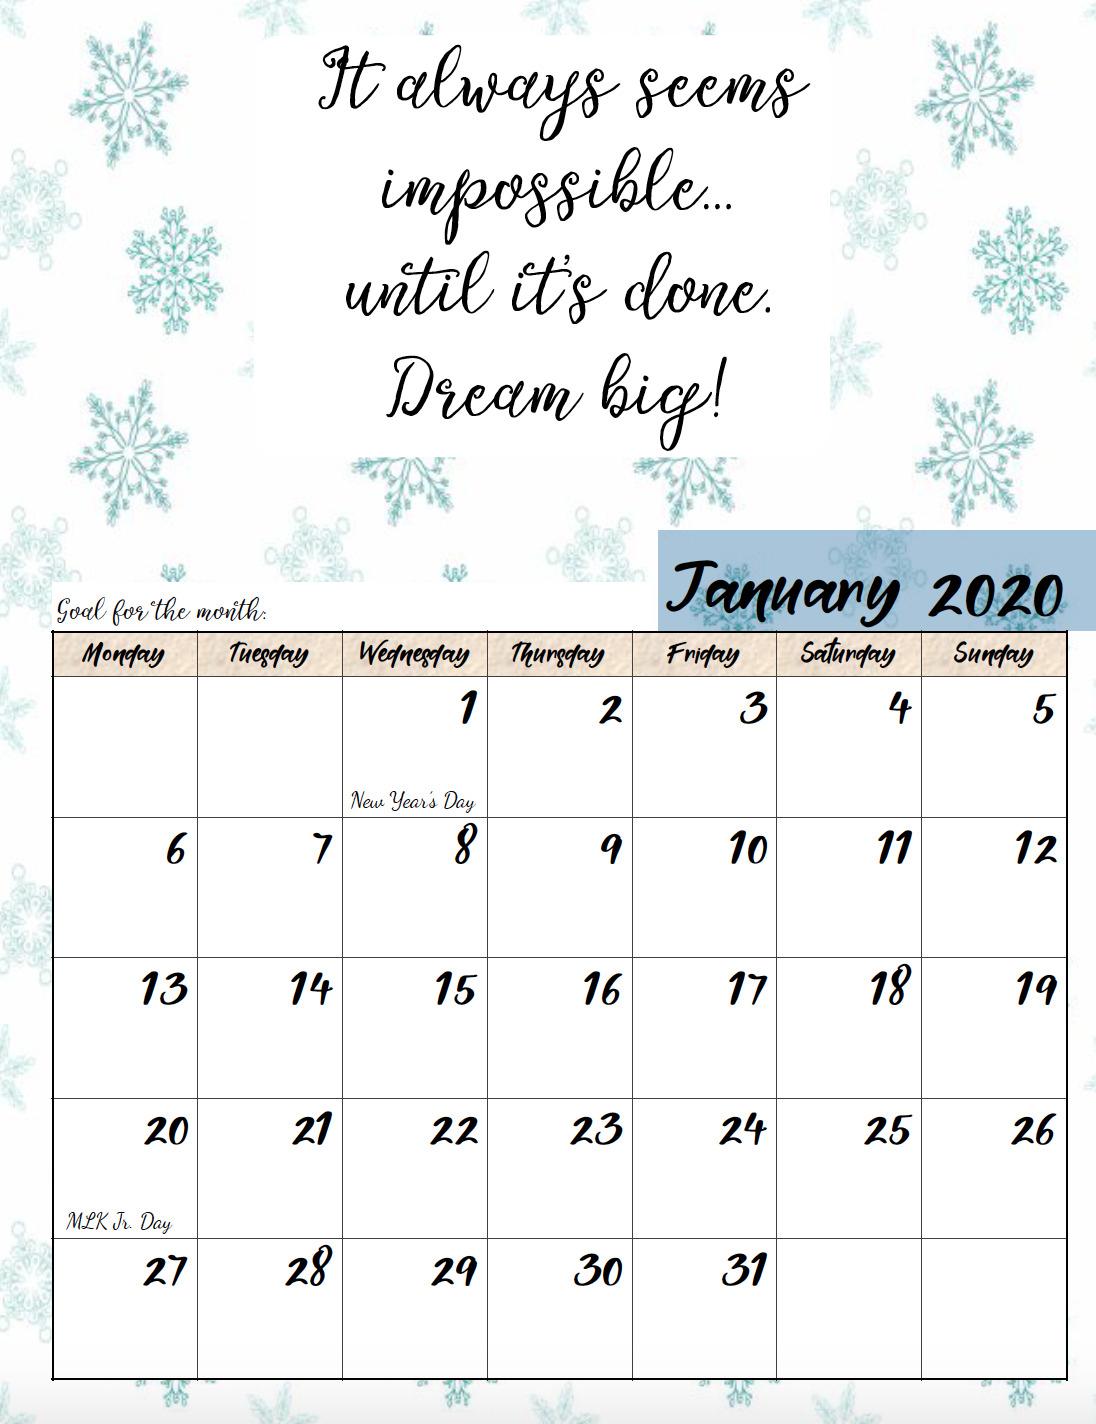 Free Printable 2020 Monday Start Monthly Motivational Calendar throughout Printable 2020 Calendar Starting Monday